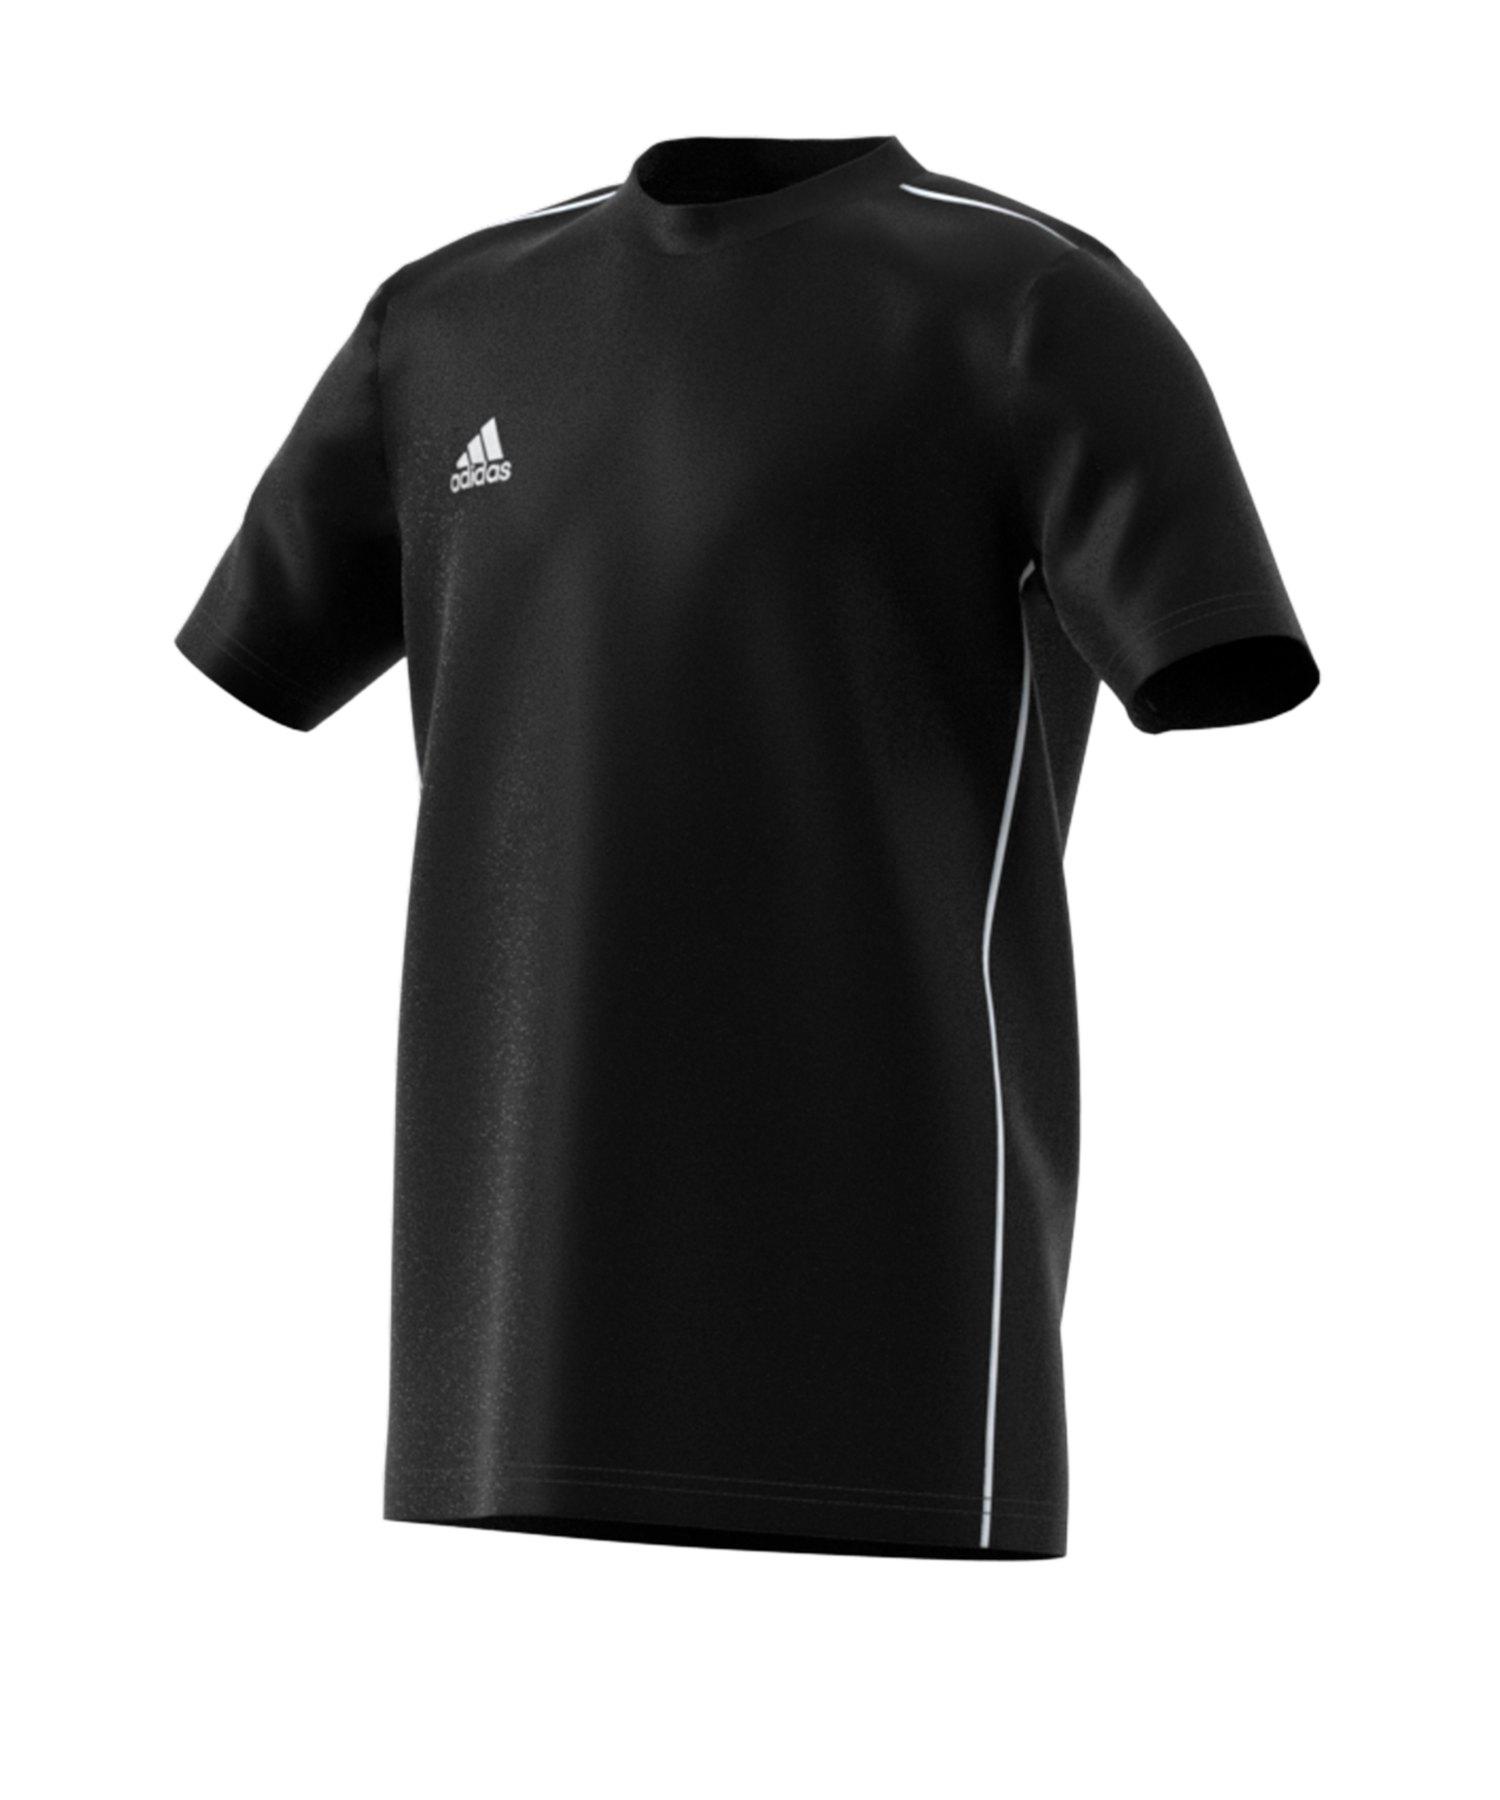 adidas Core 18 Tee T-Shirt Kids Schwarz Weiss - schwarz